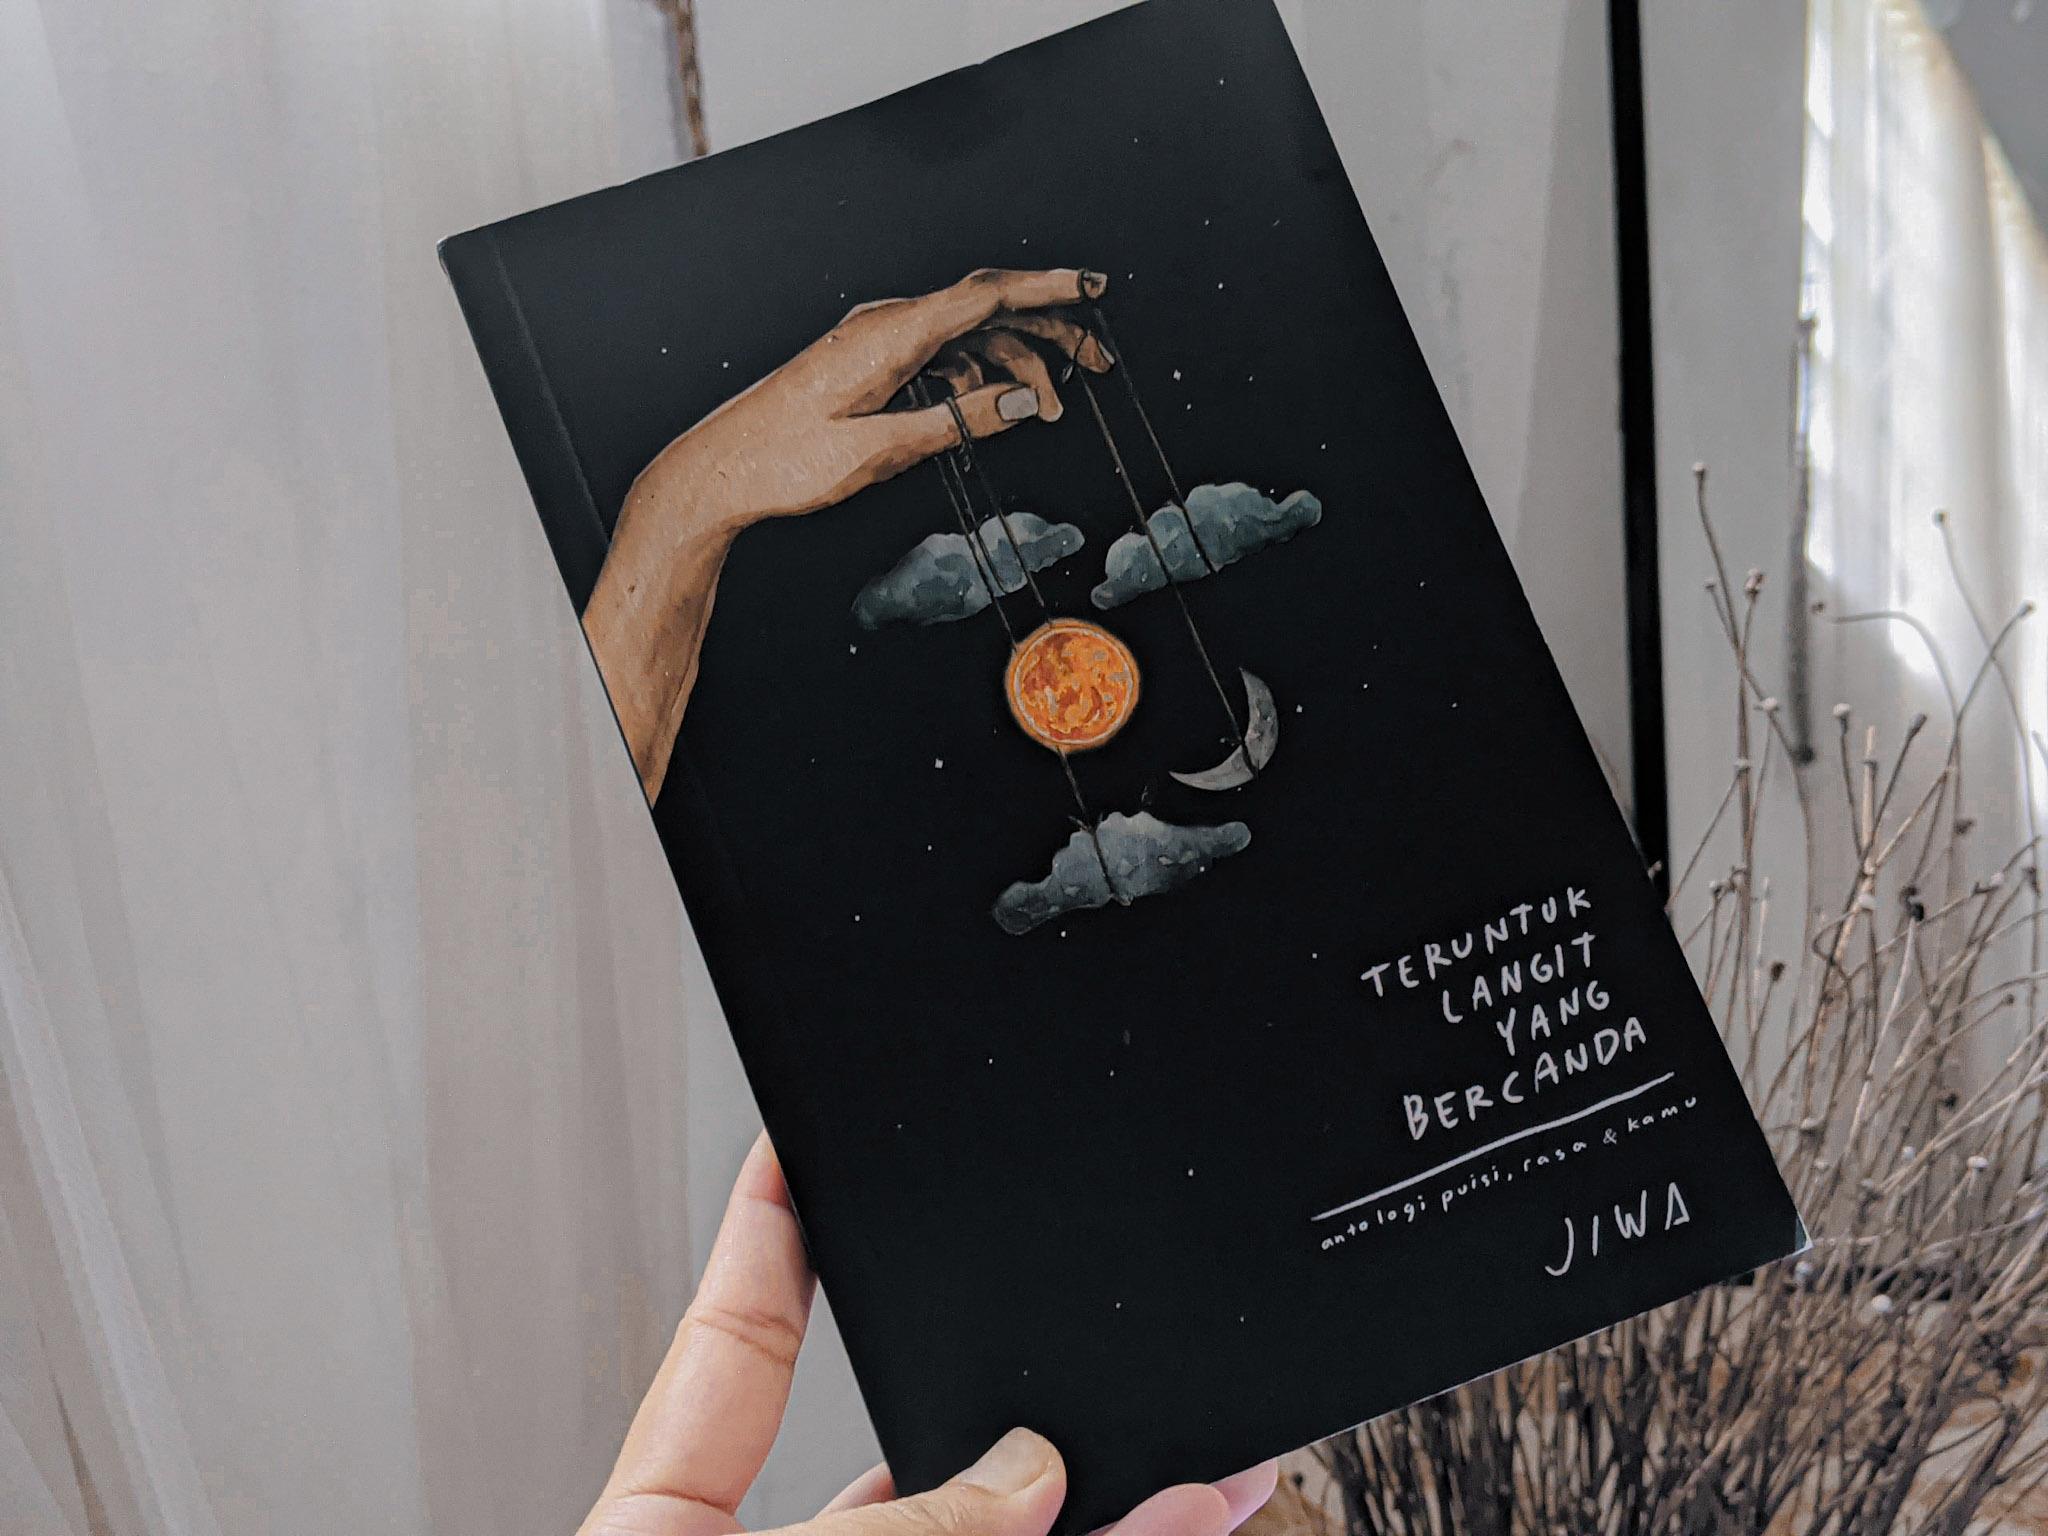 Buku Teruntuk Langit Yang Bercanda by Mustaqim Jiwa